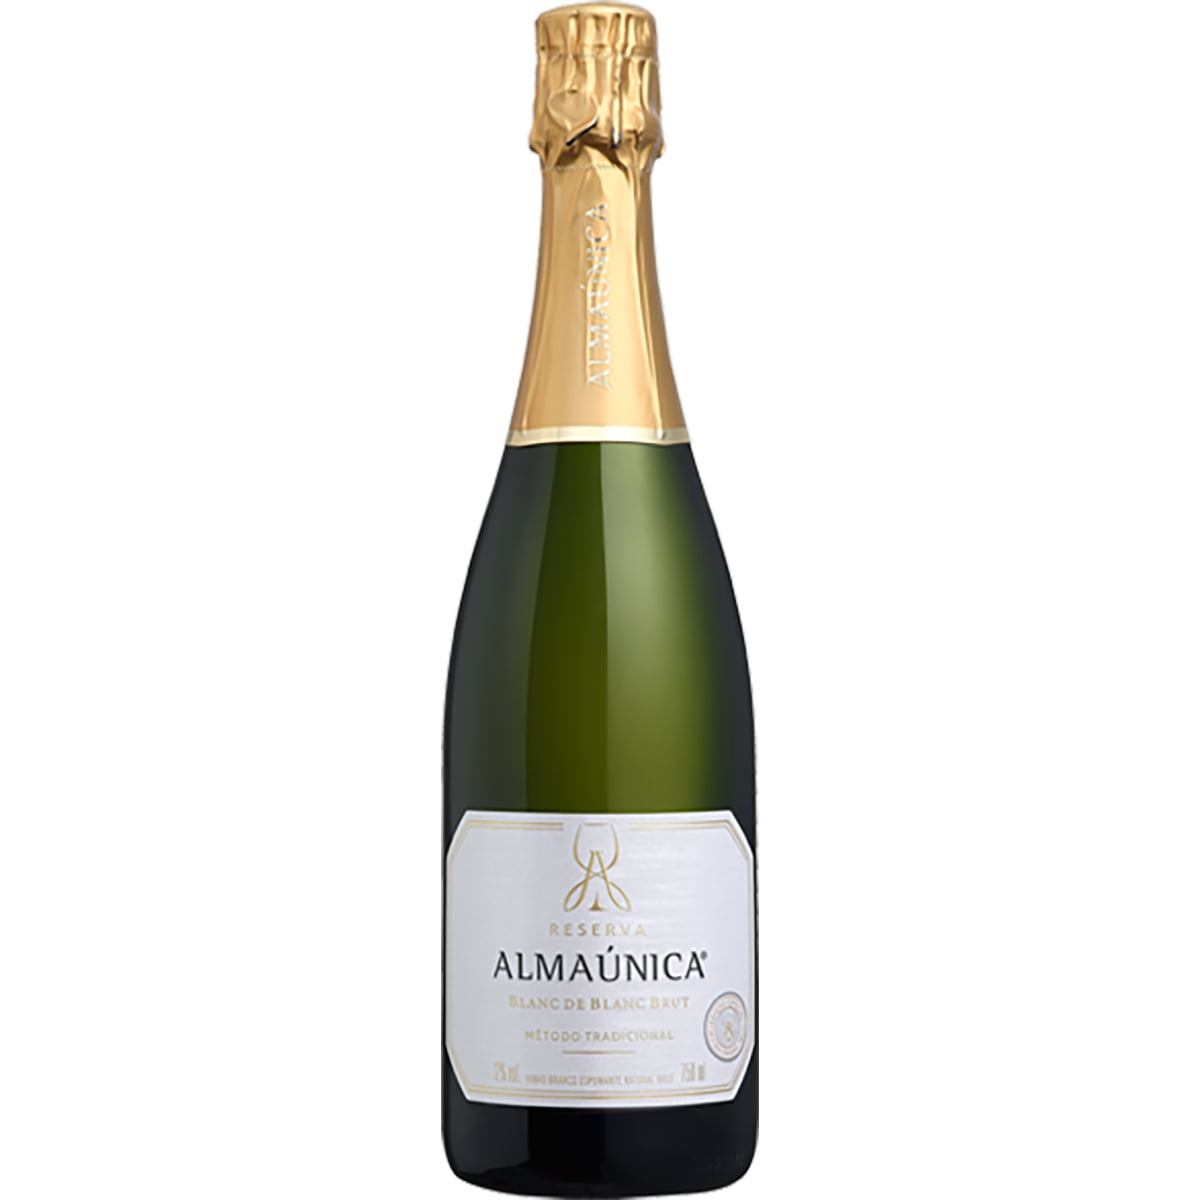 Espumante Almaúnica Brut 100% Chardonnay 750ml